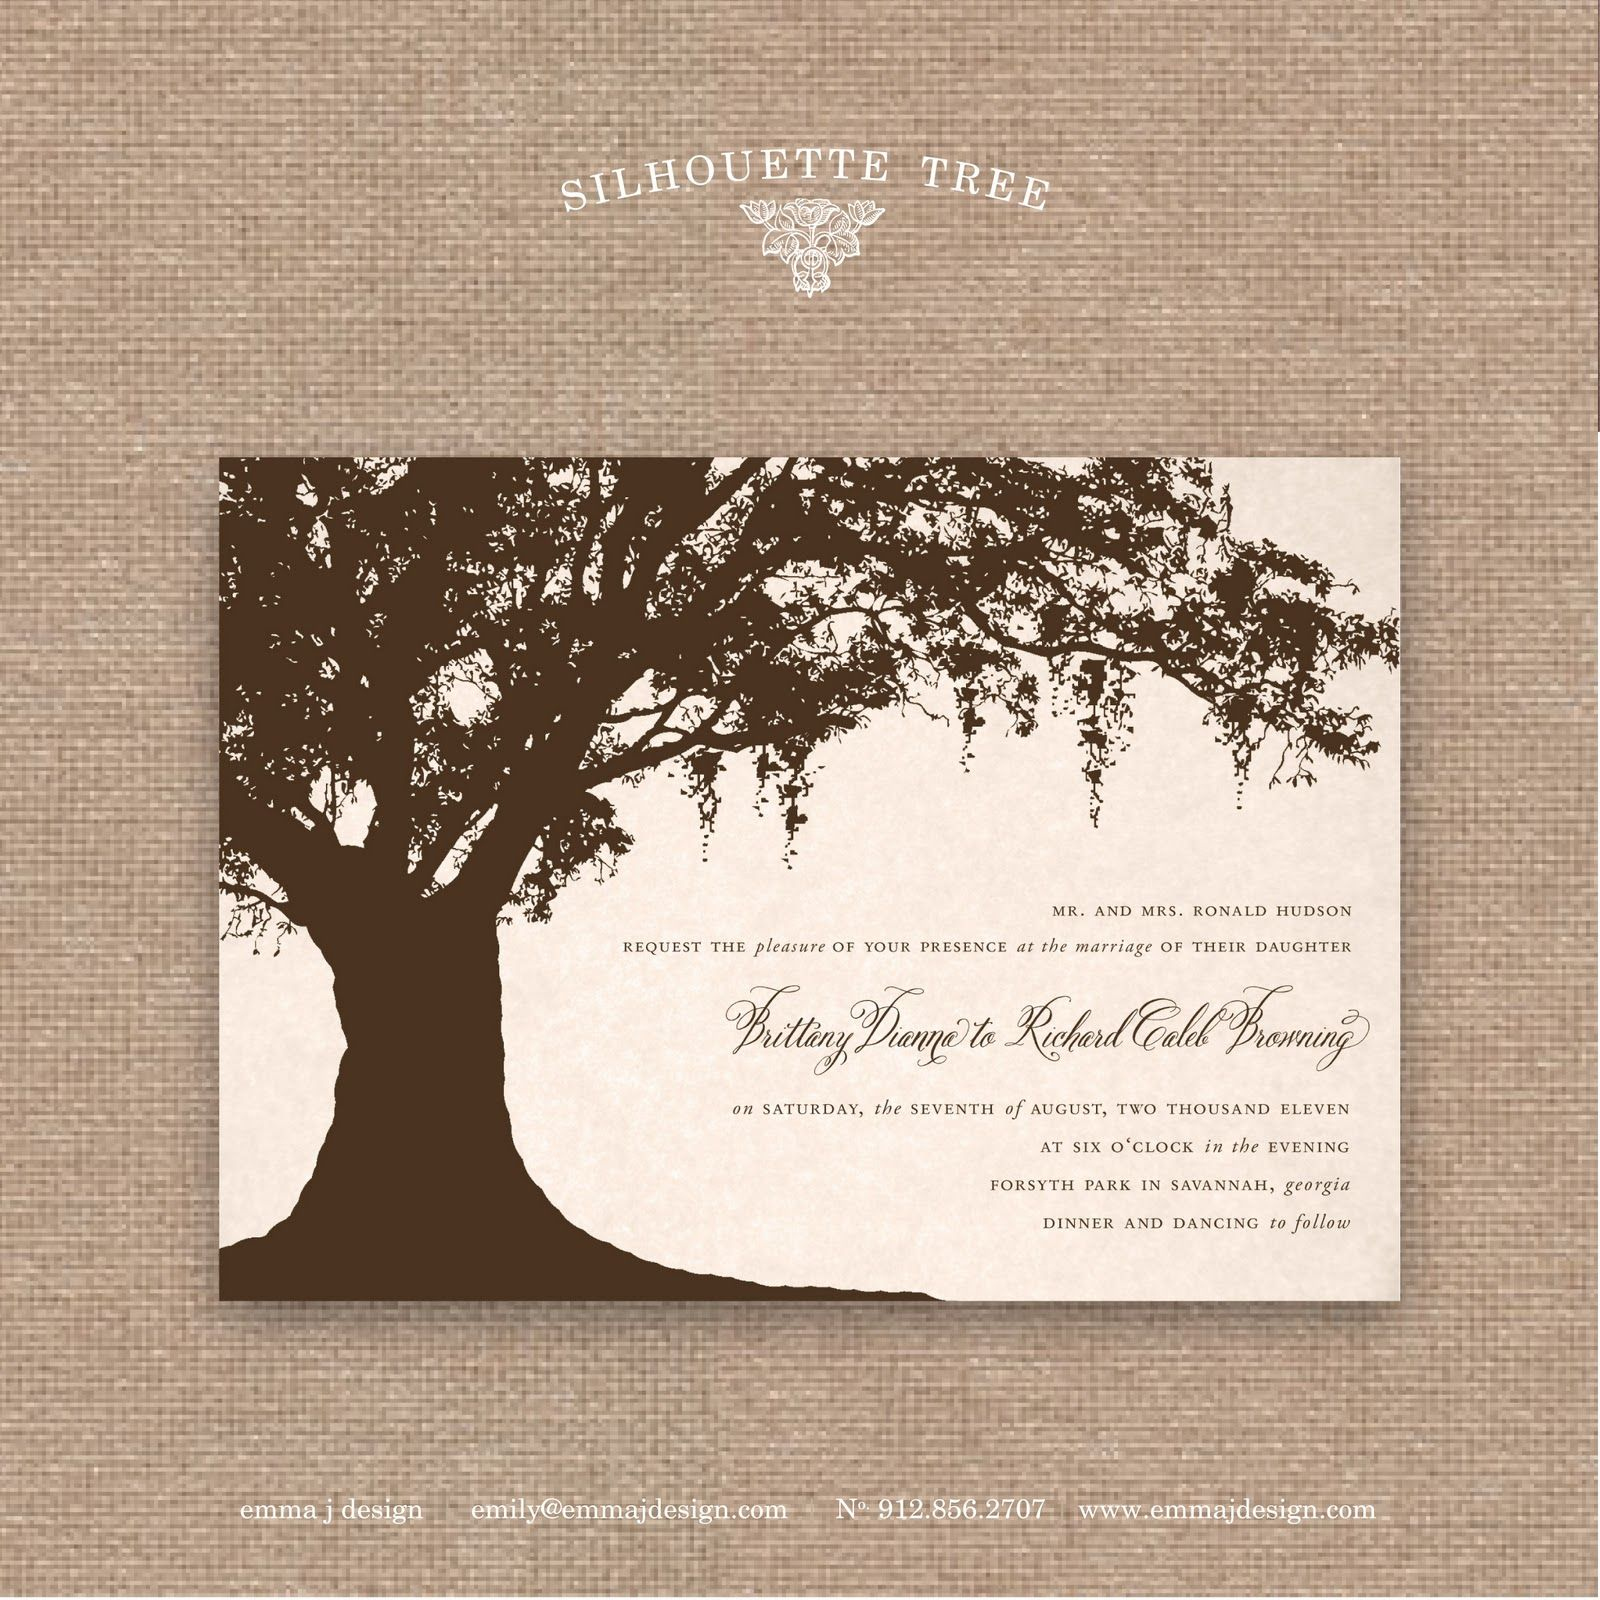 Awesome Savannah Designer, Emily McCarthy : BLOG: The Savannah Collection :  Savannah Wedding Invitations { Amazing Ideas